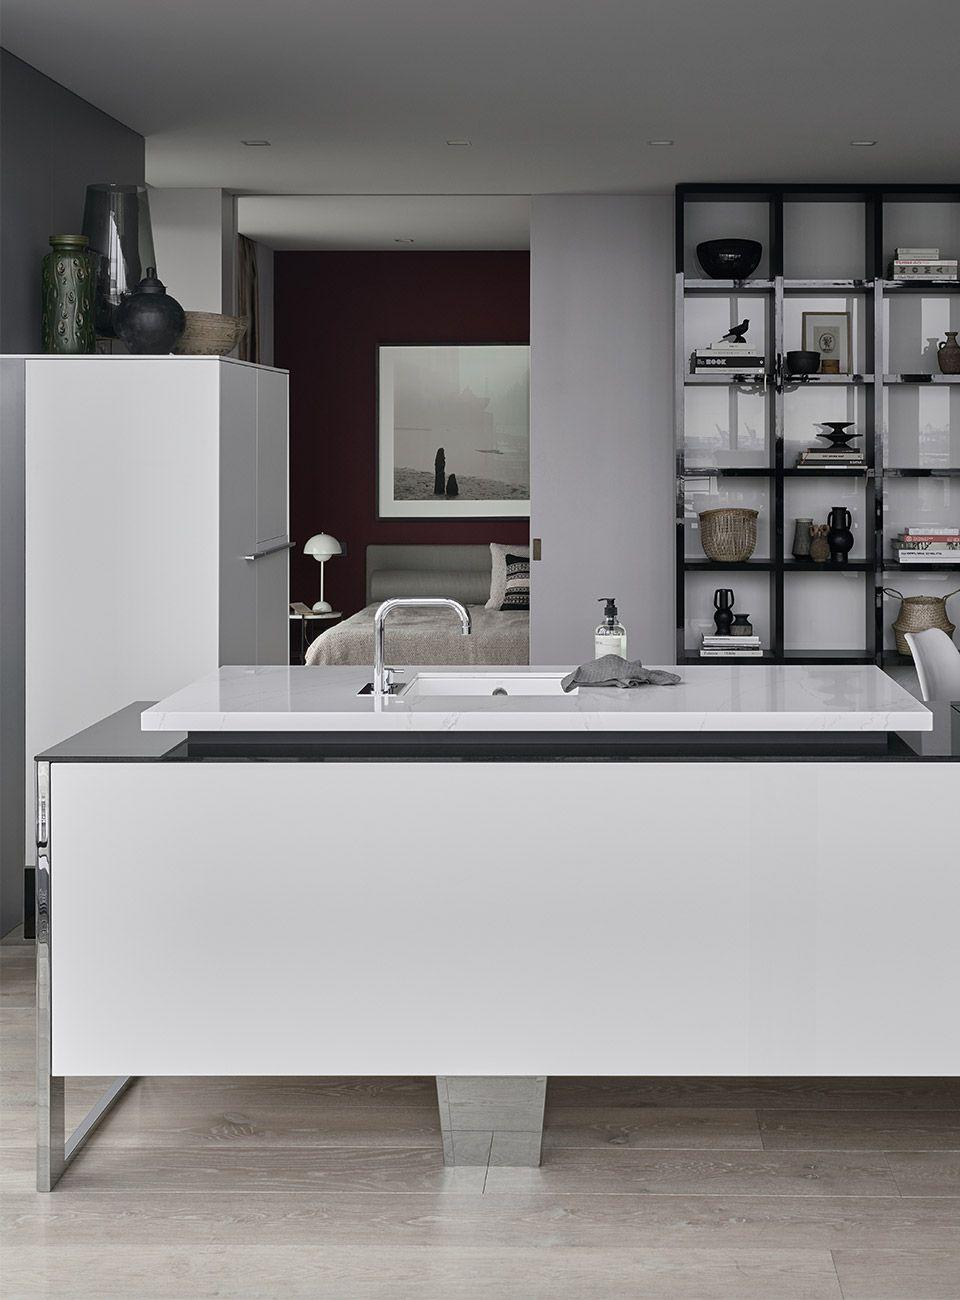 Küche +VENOVO von Poggenpohl | individuelles Küchendesign ...